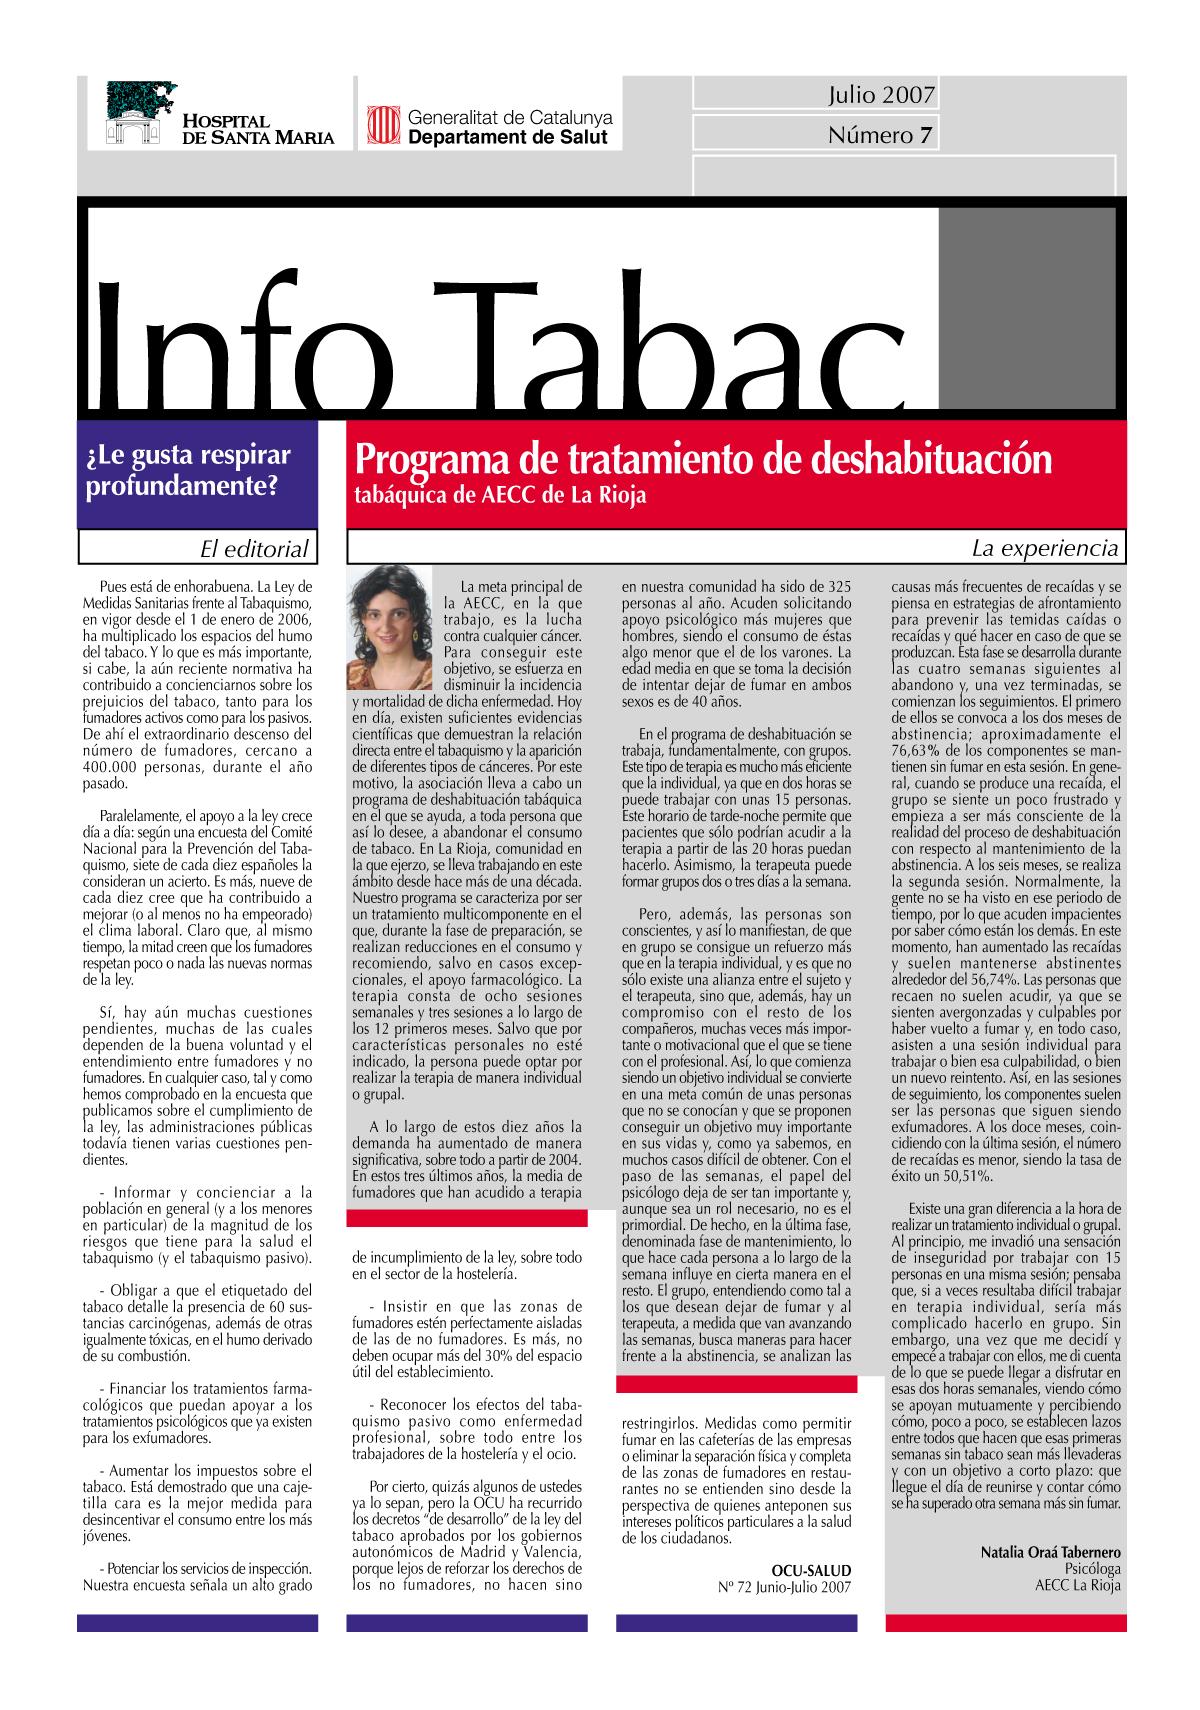 Info Tabac nº7 - Julio 2007